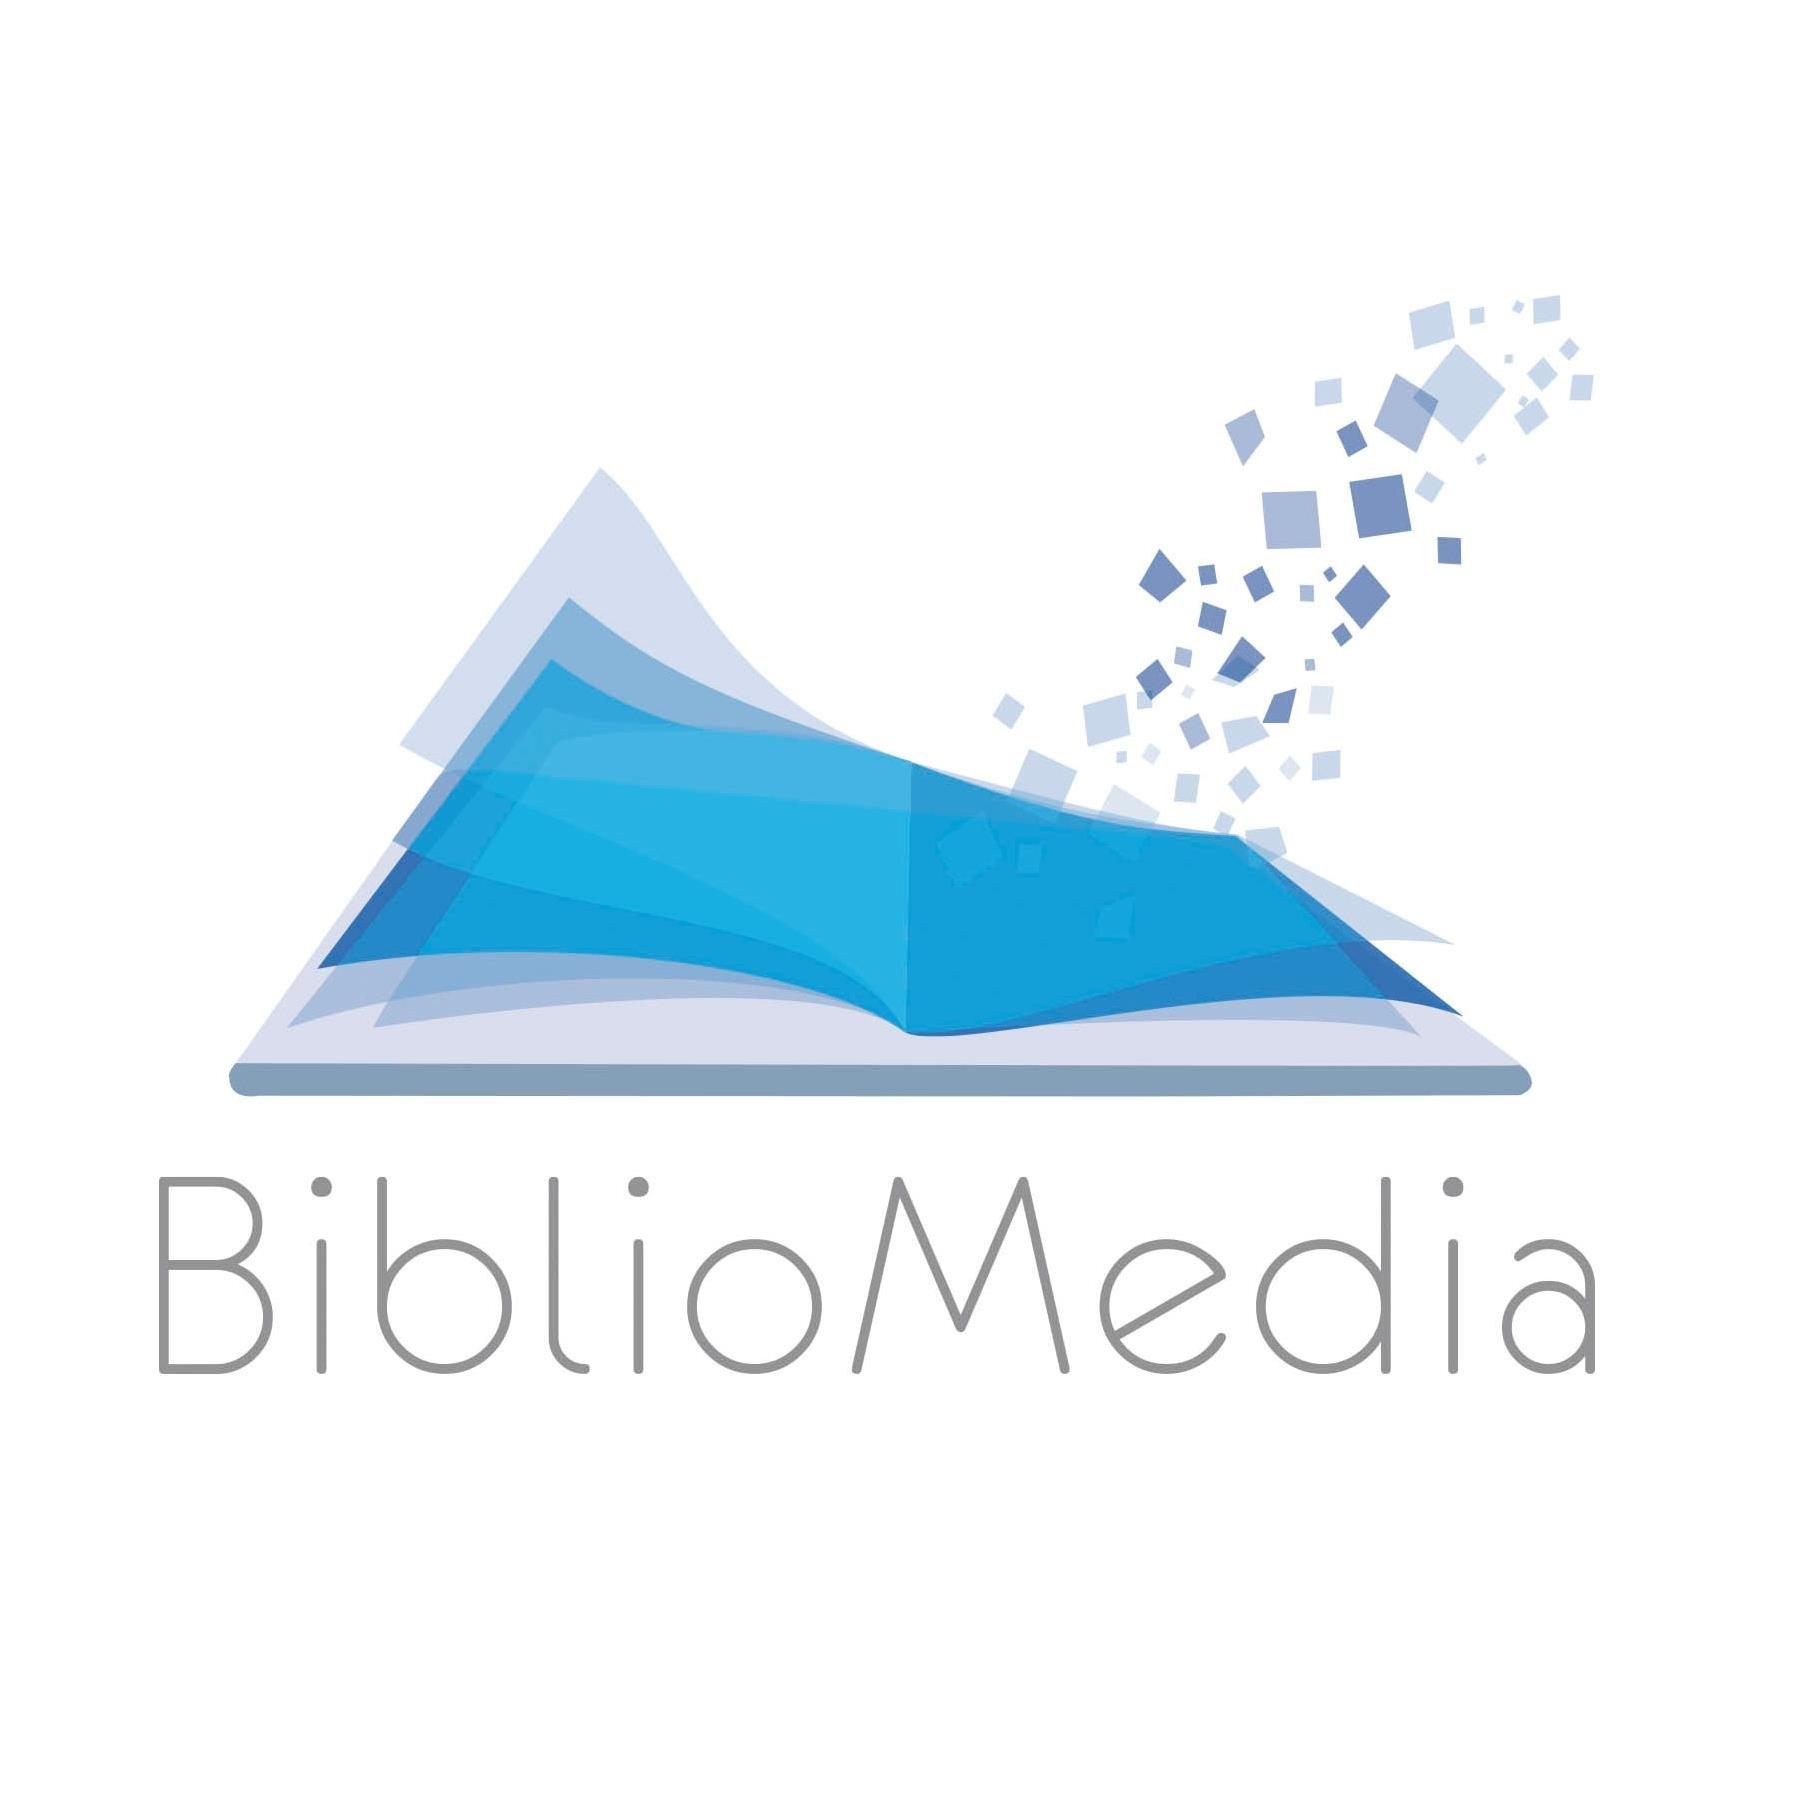 Bibliomedia